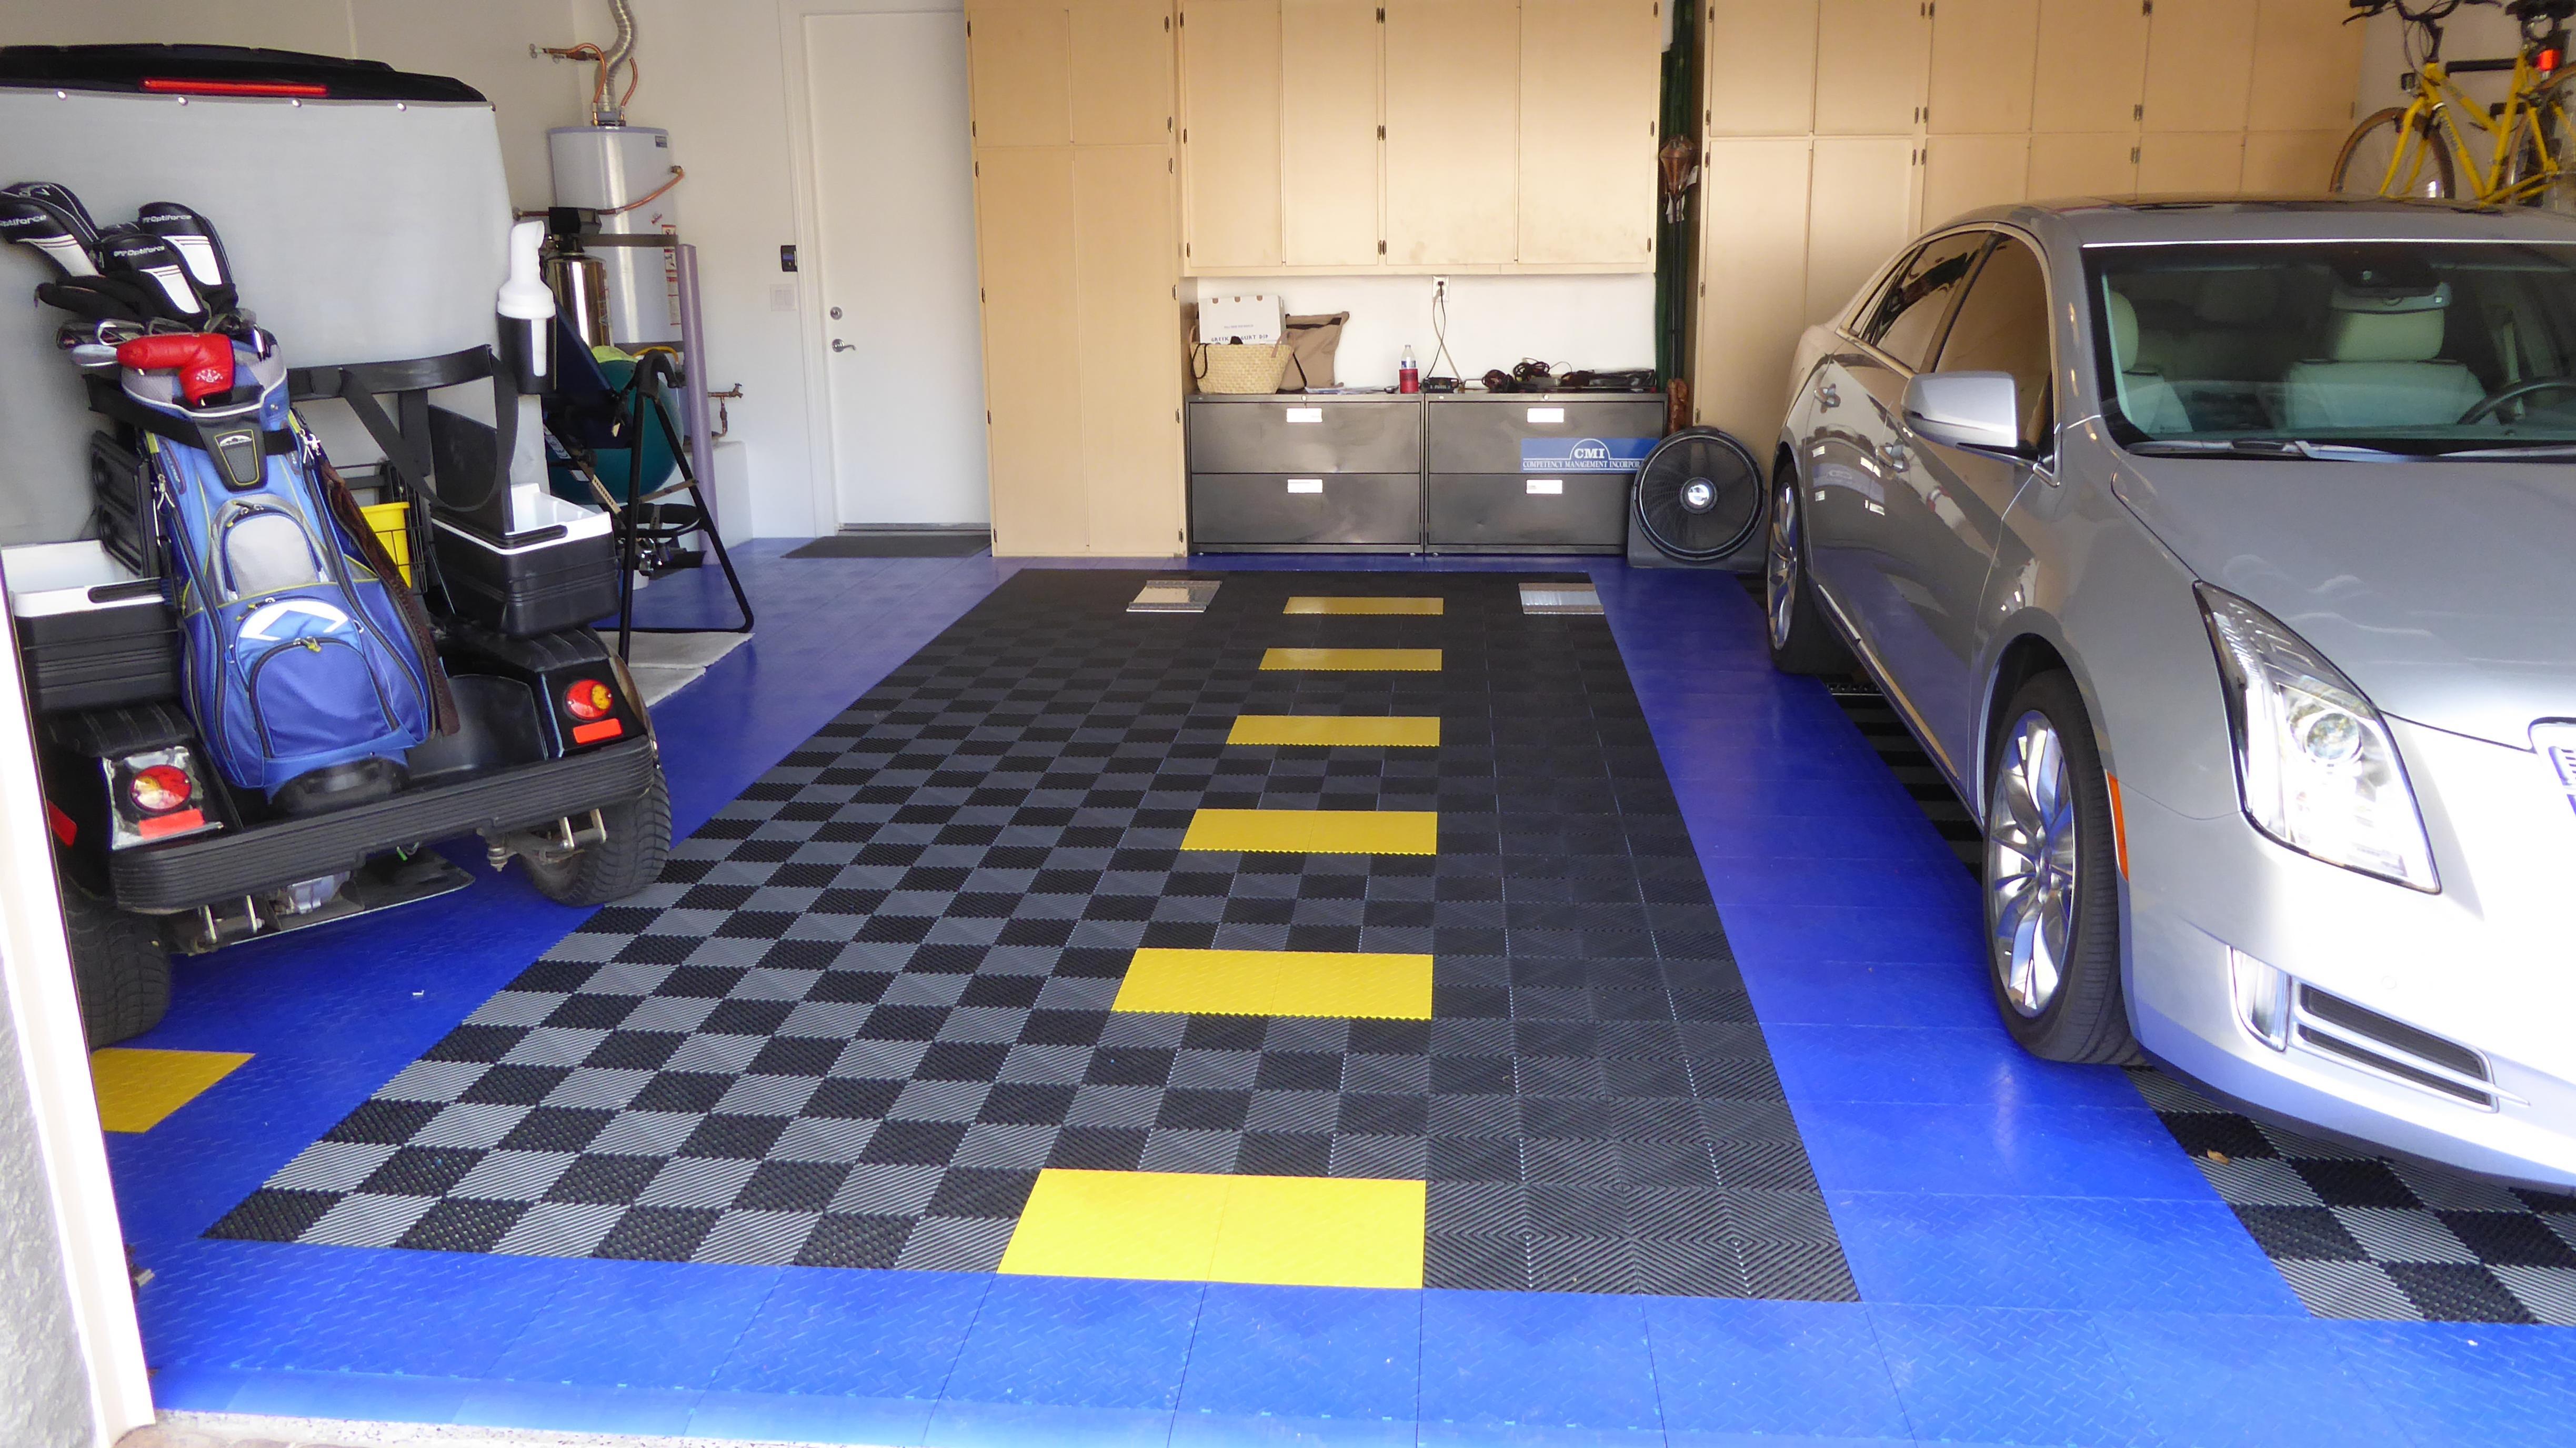 Installing racedeck garage flooring name p1050253g views 1517 size 116 dailygadgetfo Gallery